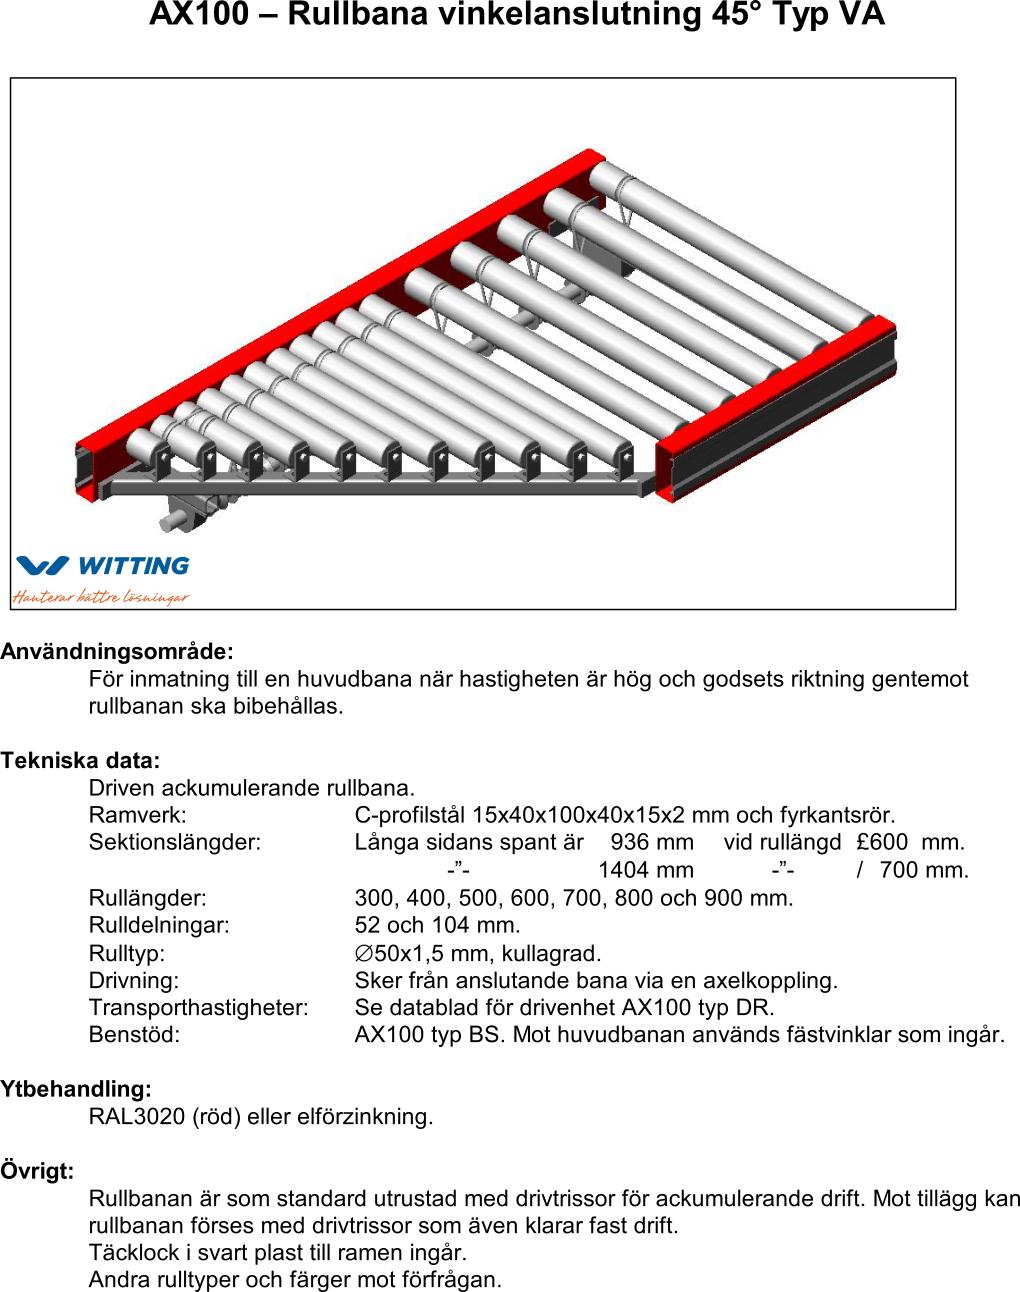 AX100 – Rullbana vinkelanslutning 45° Typ VA